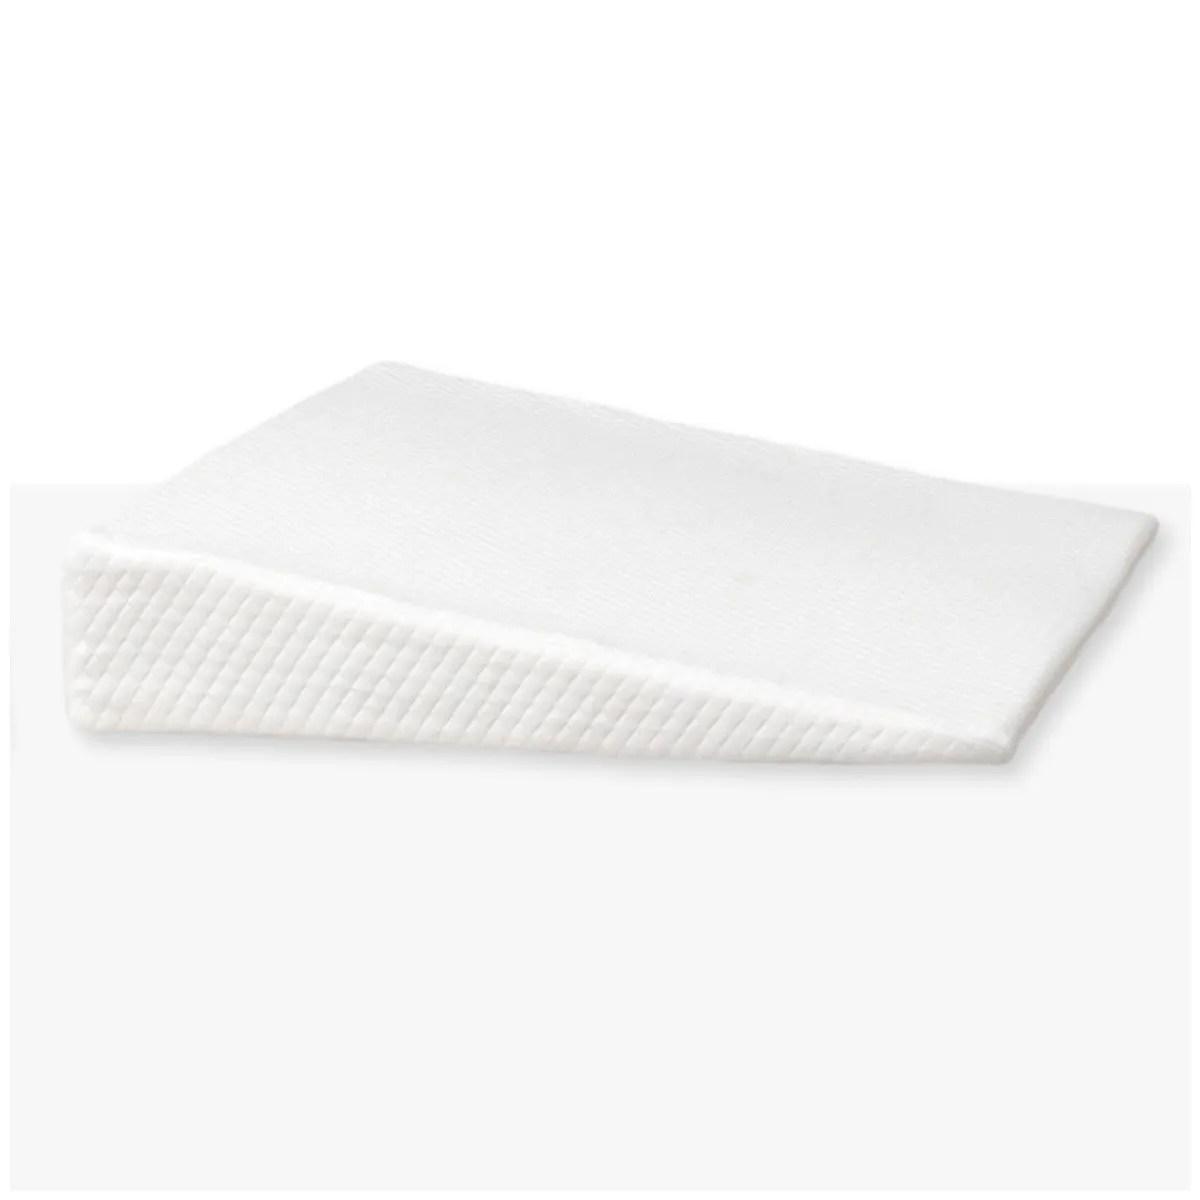 kally sleep acid reflux wedge pillow